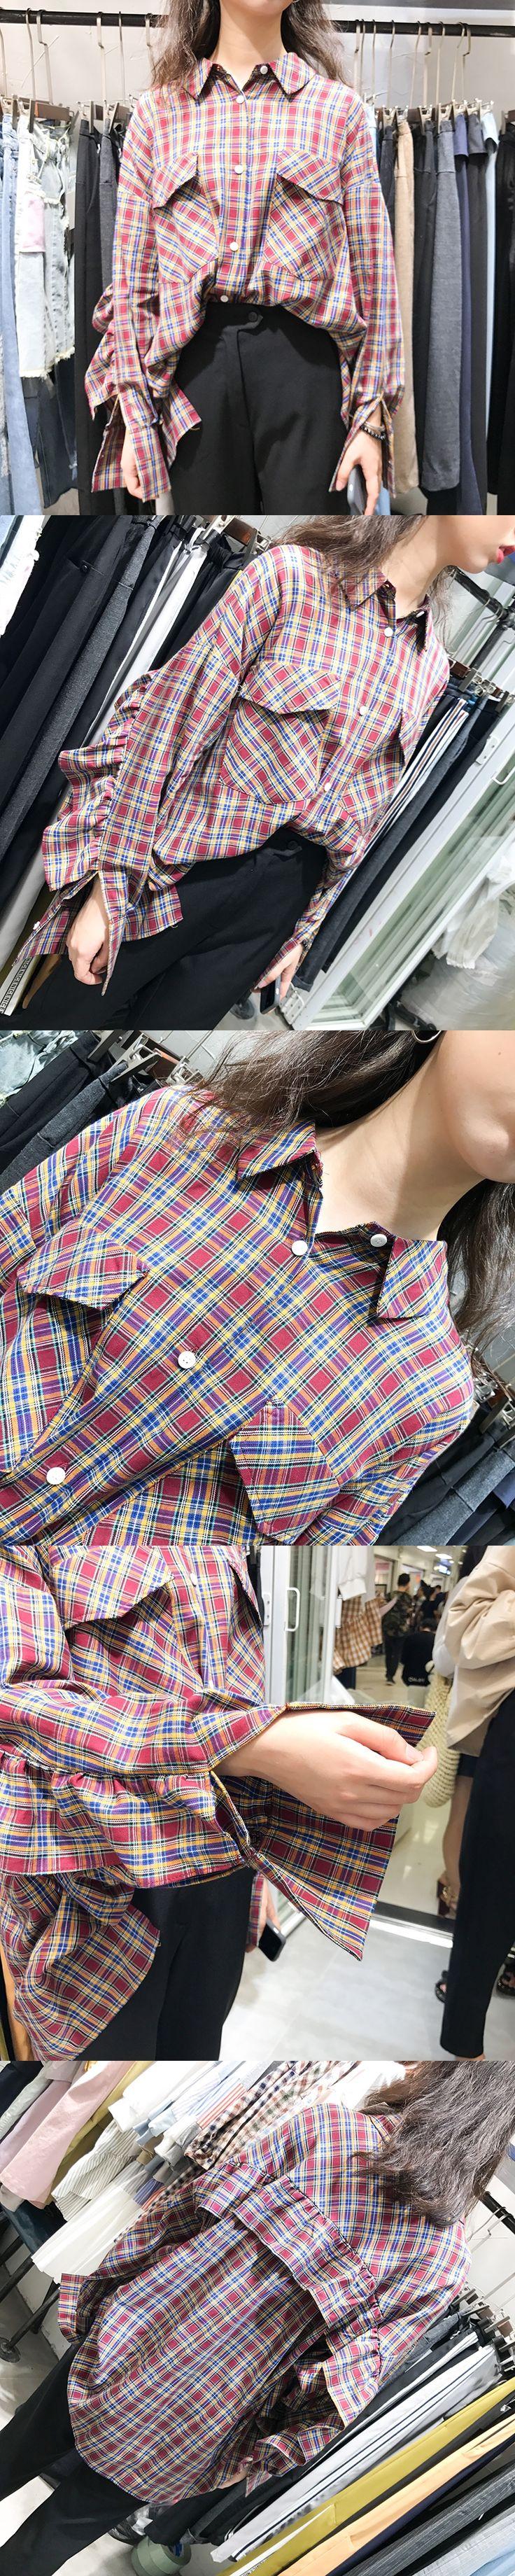 2017 Autumn Women Plaid Shirts Lady Fashion Ruffles Blouse Long Sleeve Polo Collar Blusas Basic Tops + Jeans Set Student Outfit